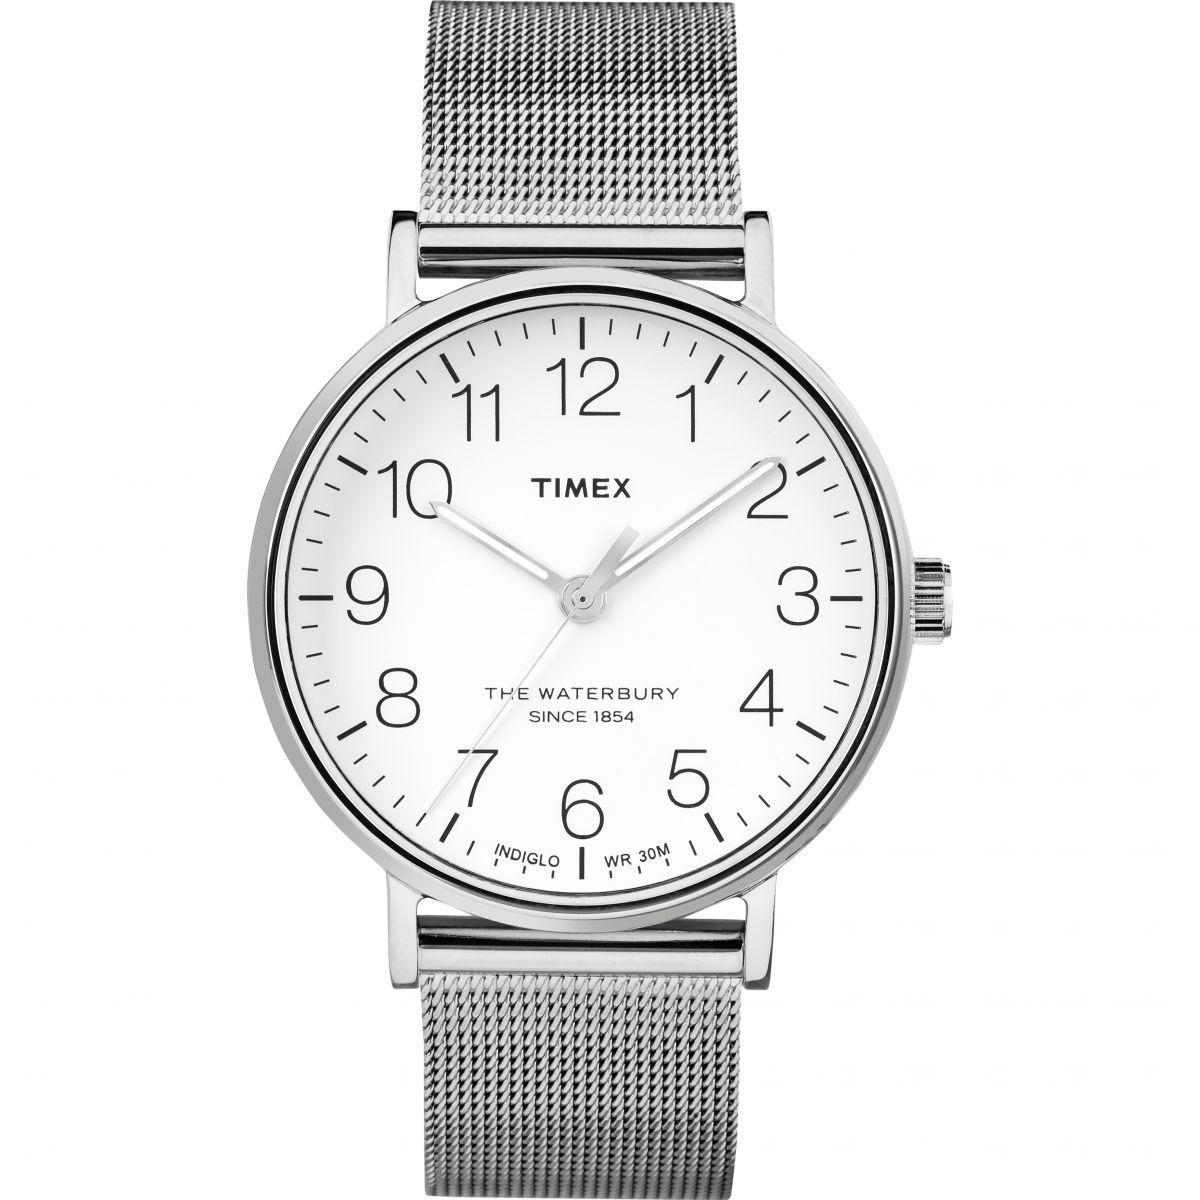 8640f7eff136 reloj timex tw2r25800 100% original para caballero. Cargando zoom.